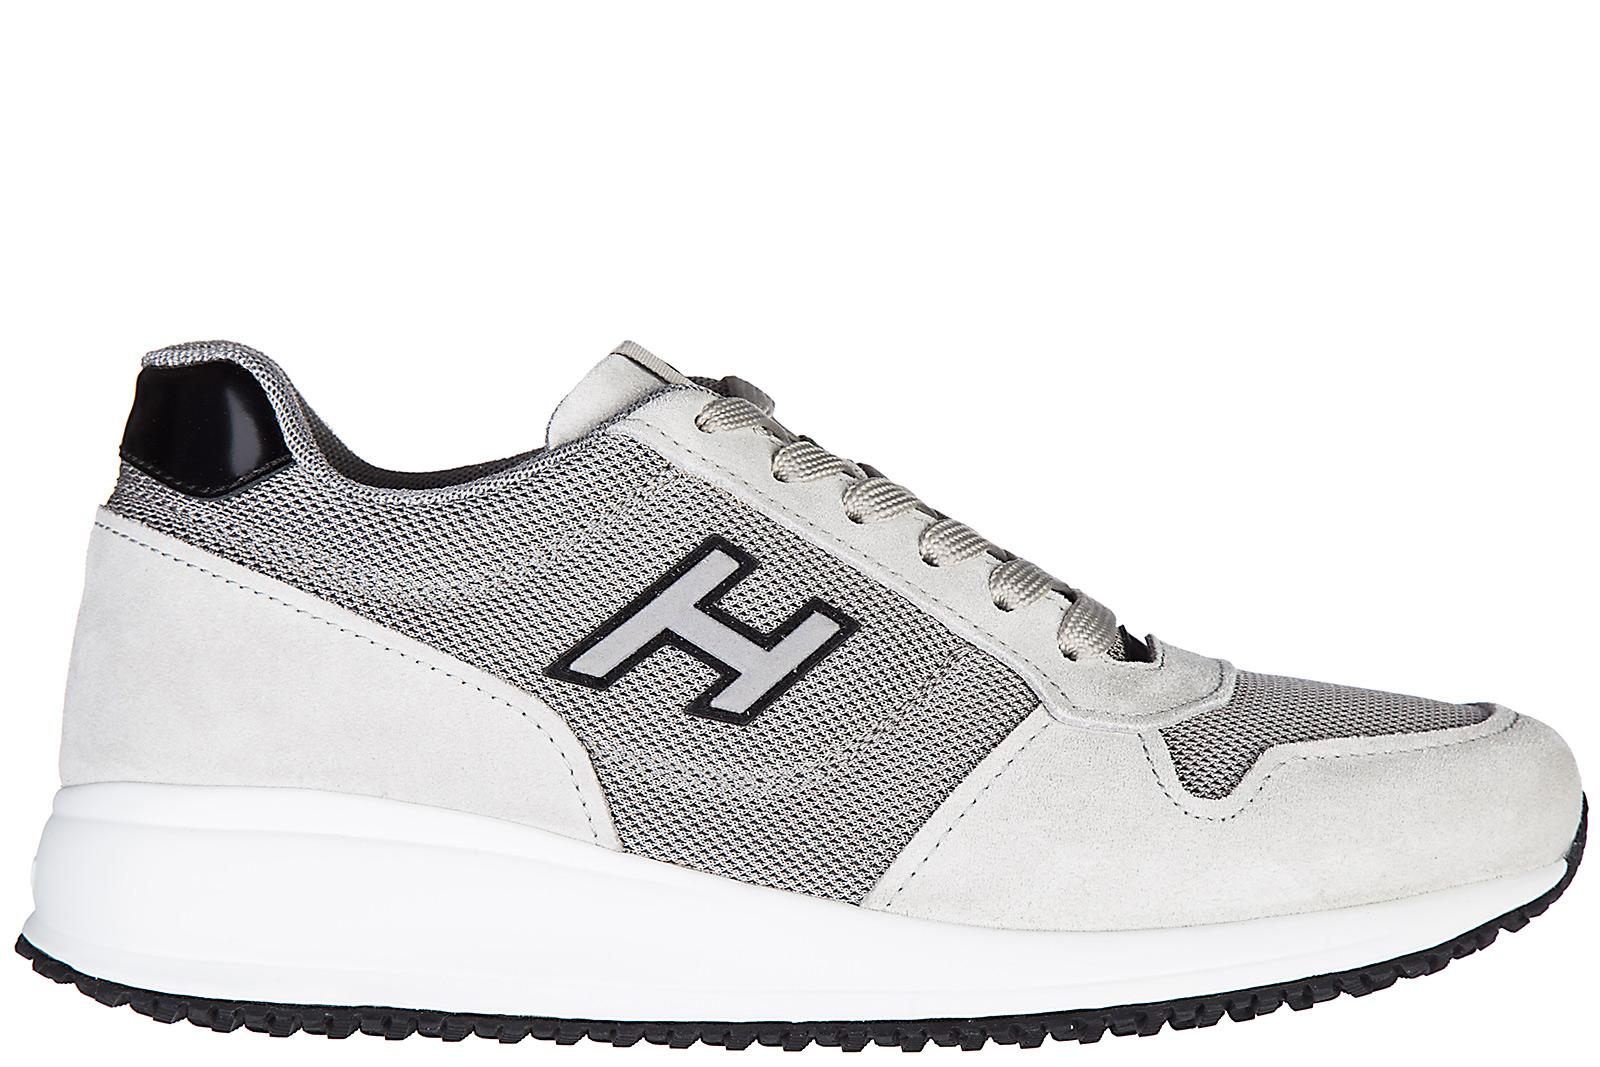 Hogan Men's Shoes Suede Trainers Sneakers Interactive N20 H Flock ...